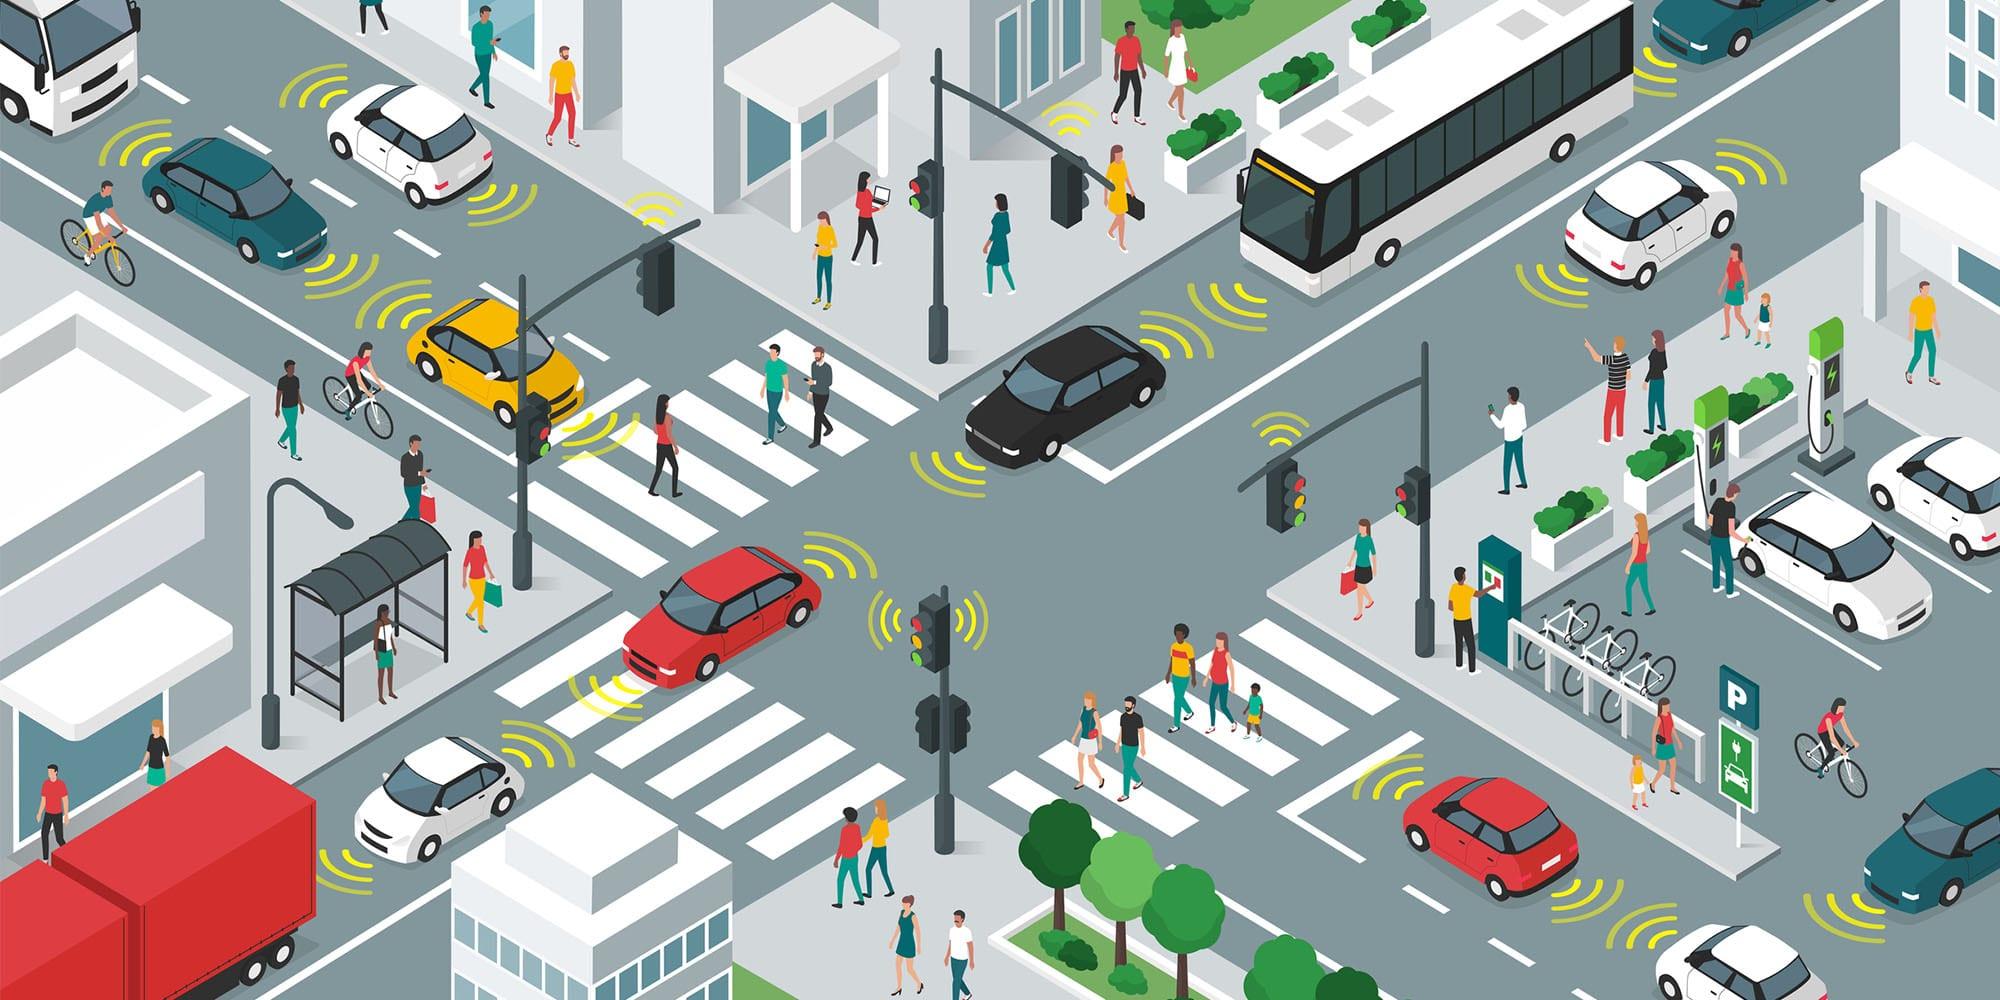 How technology can empower communities